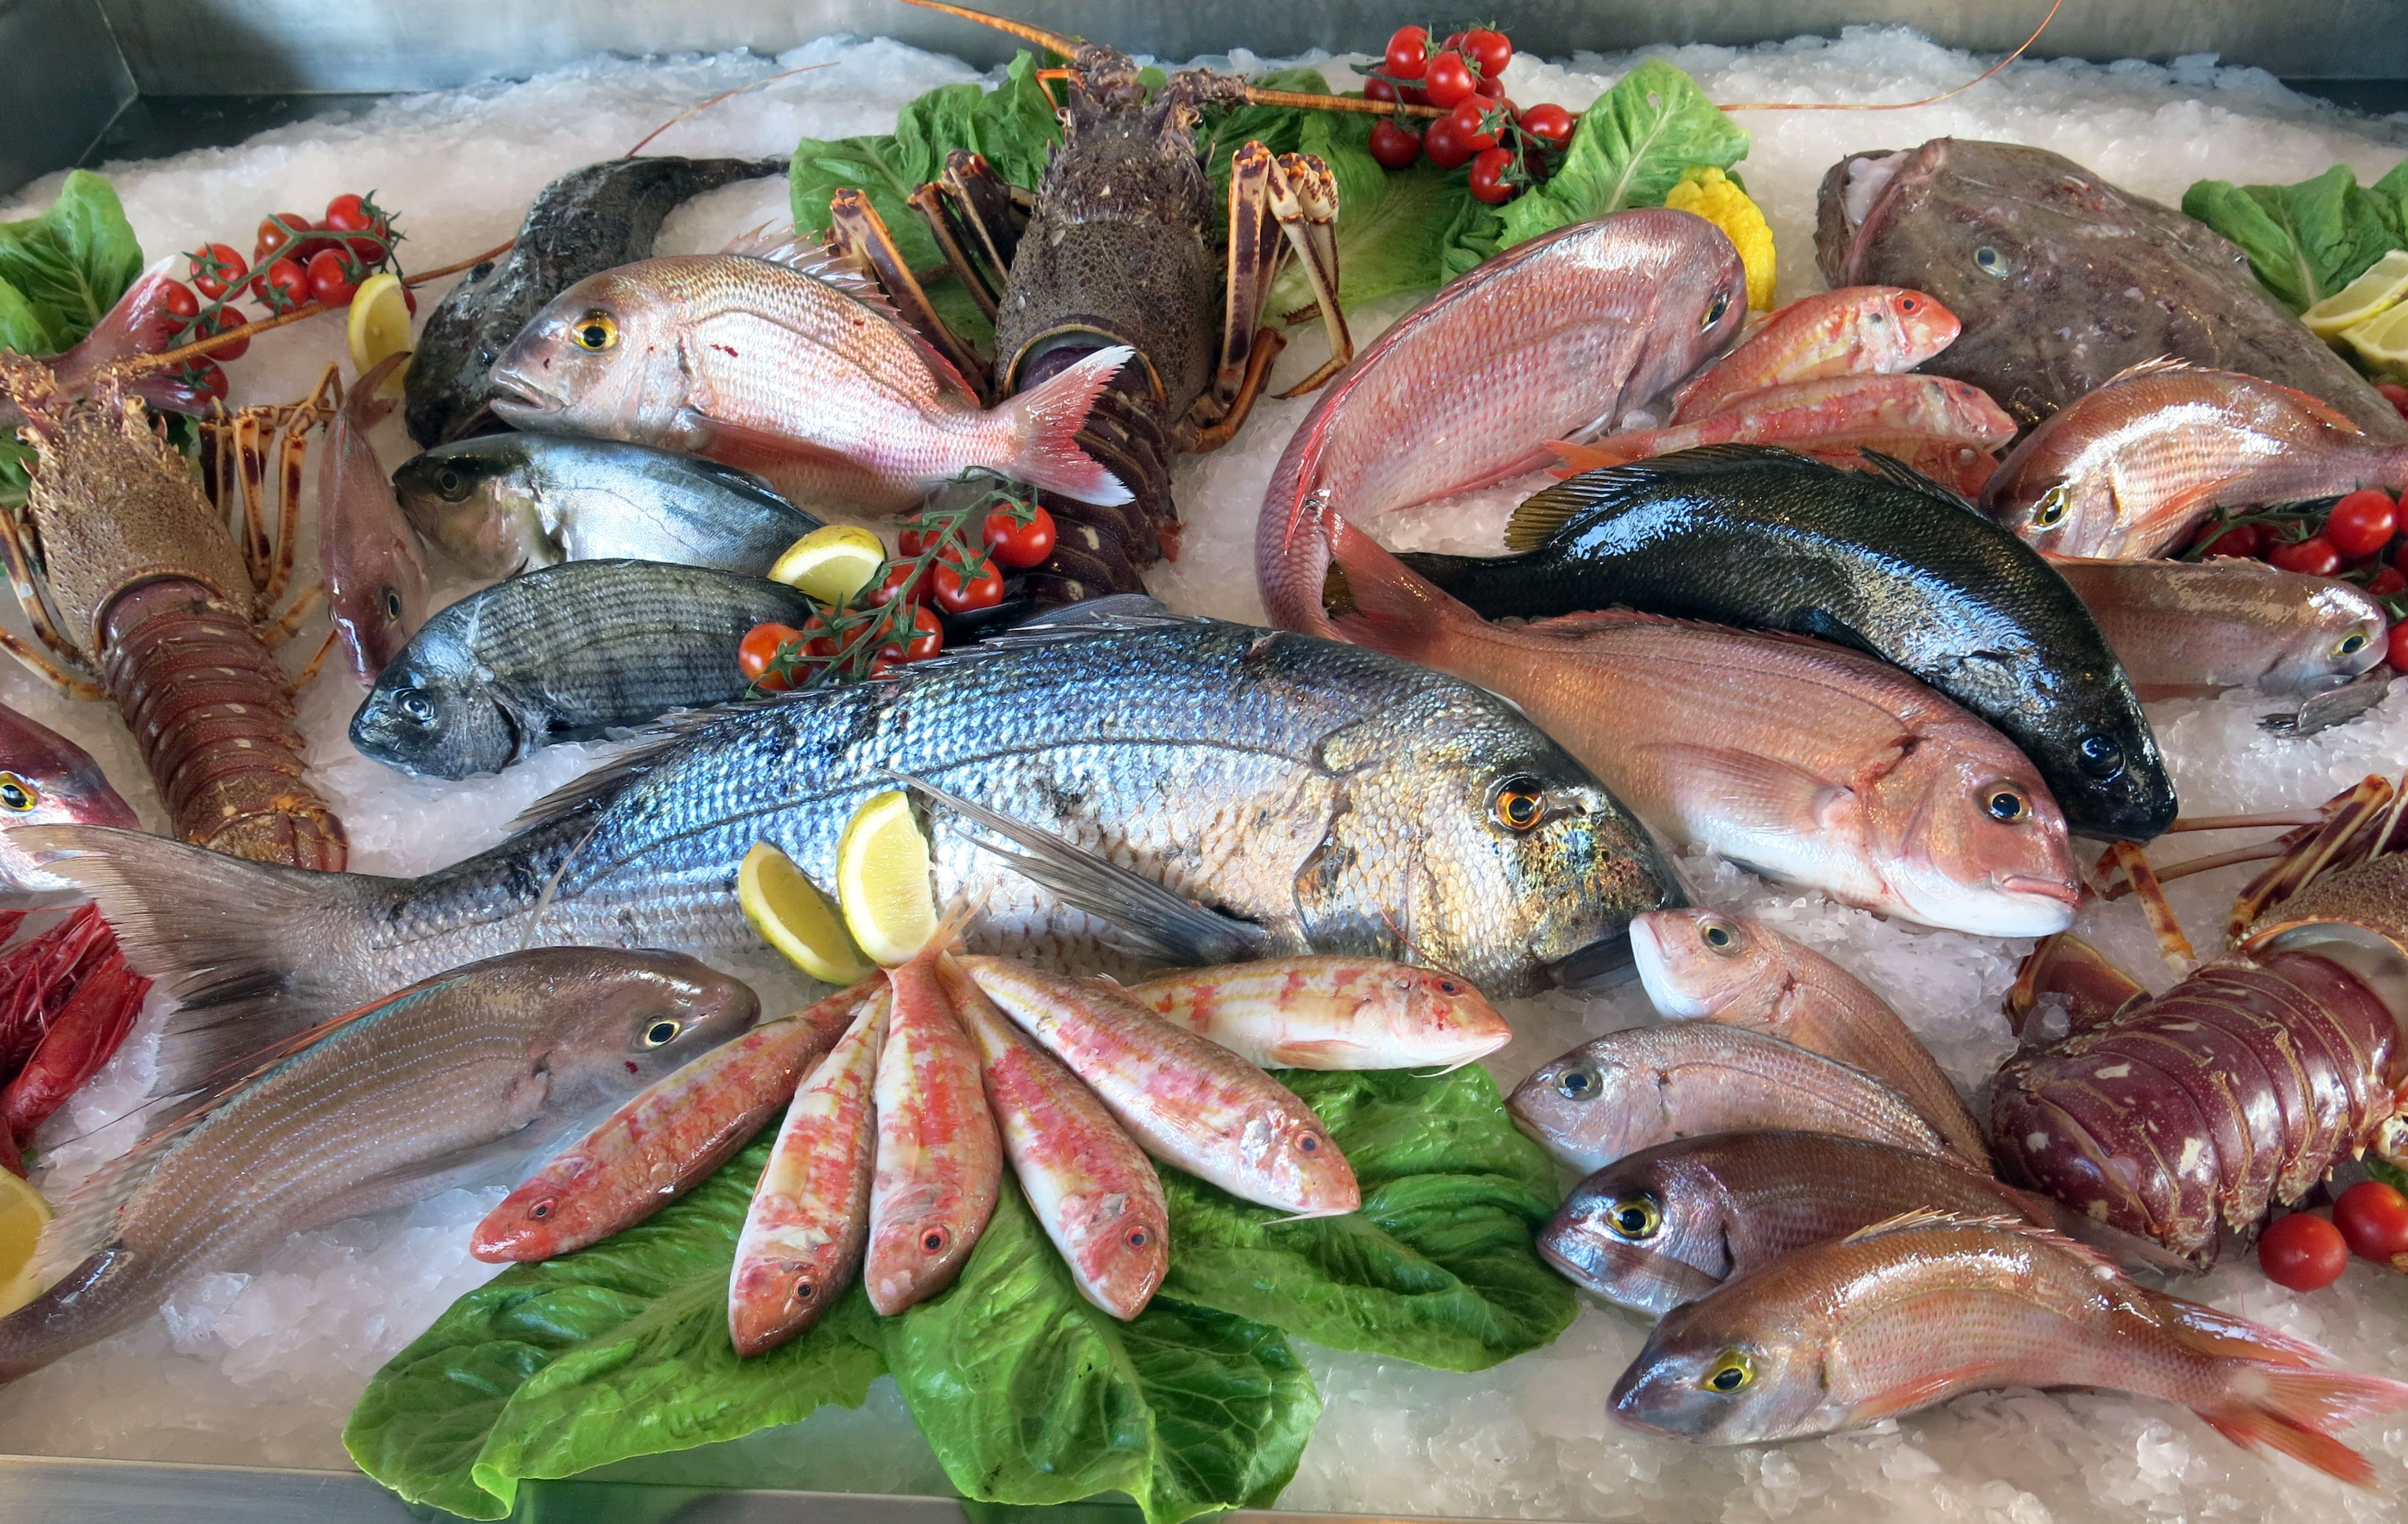 Encargos de pescado fresco en Granada